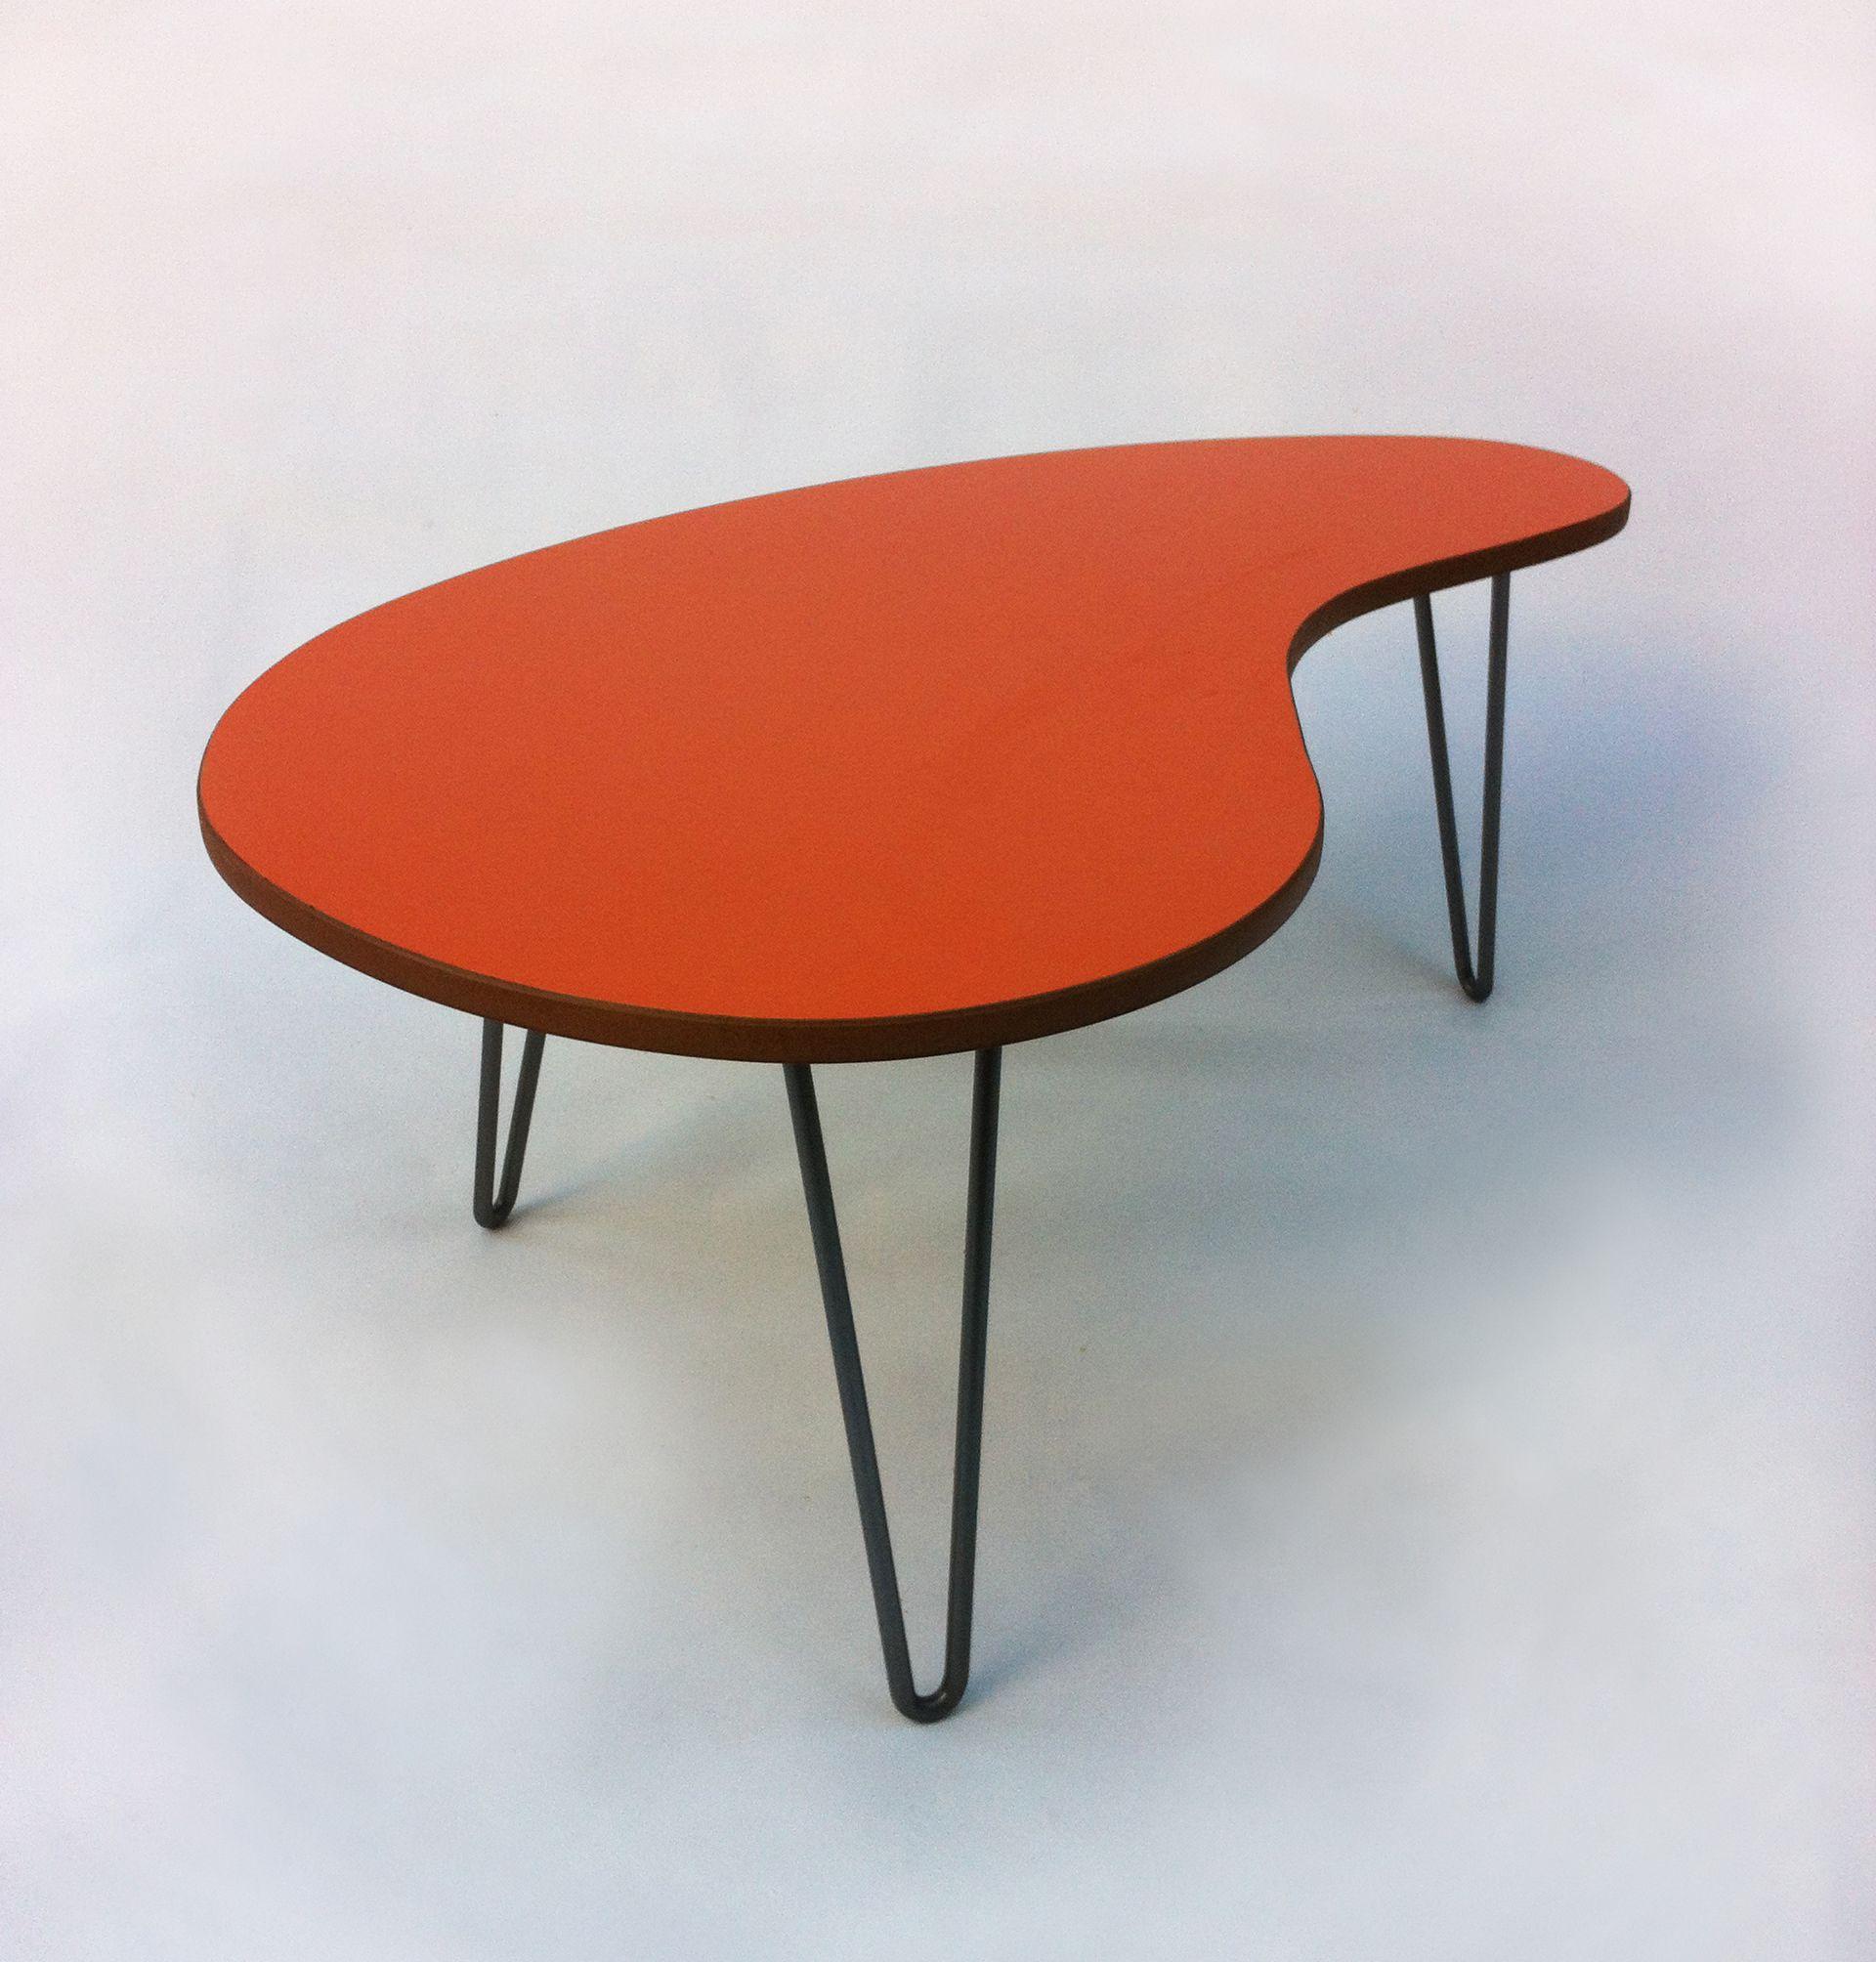 Kidney Bean Shaped Mid Century Modern Coffee Coffee Table Atomic Era Design Kidney Table [ 2008 x 1920 Pixel ]